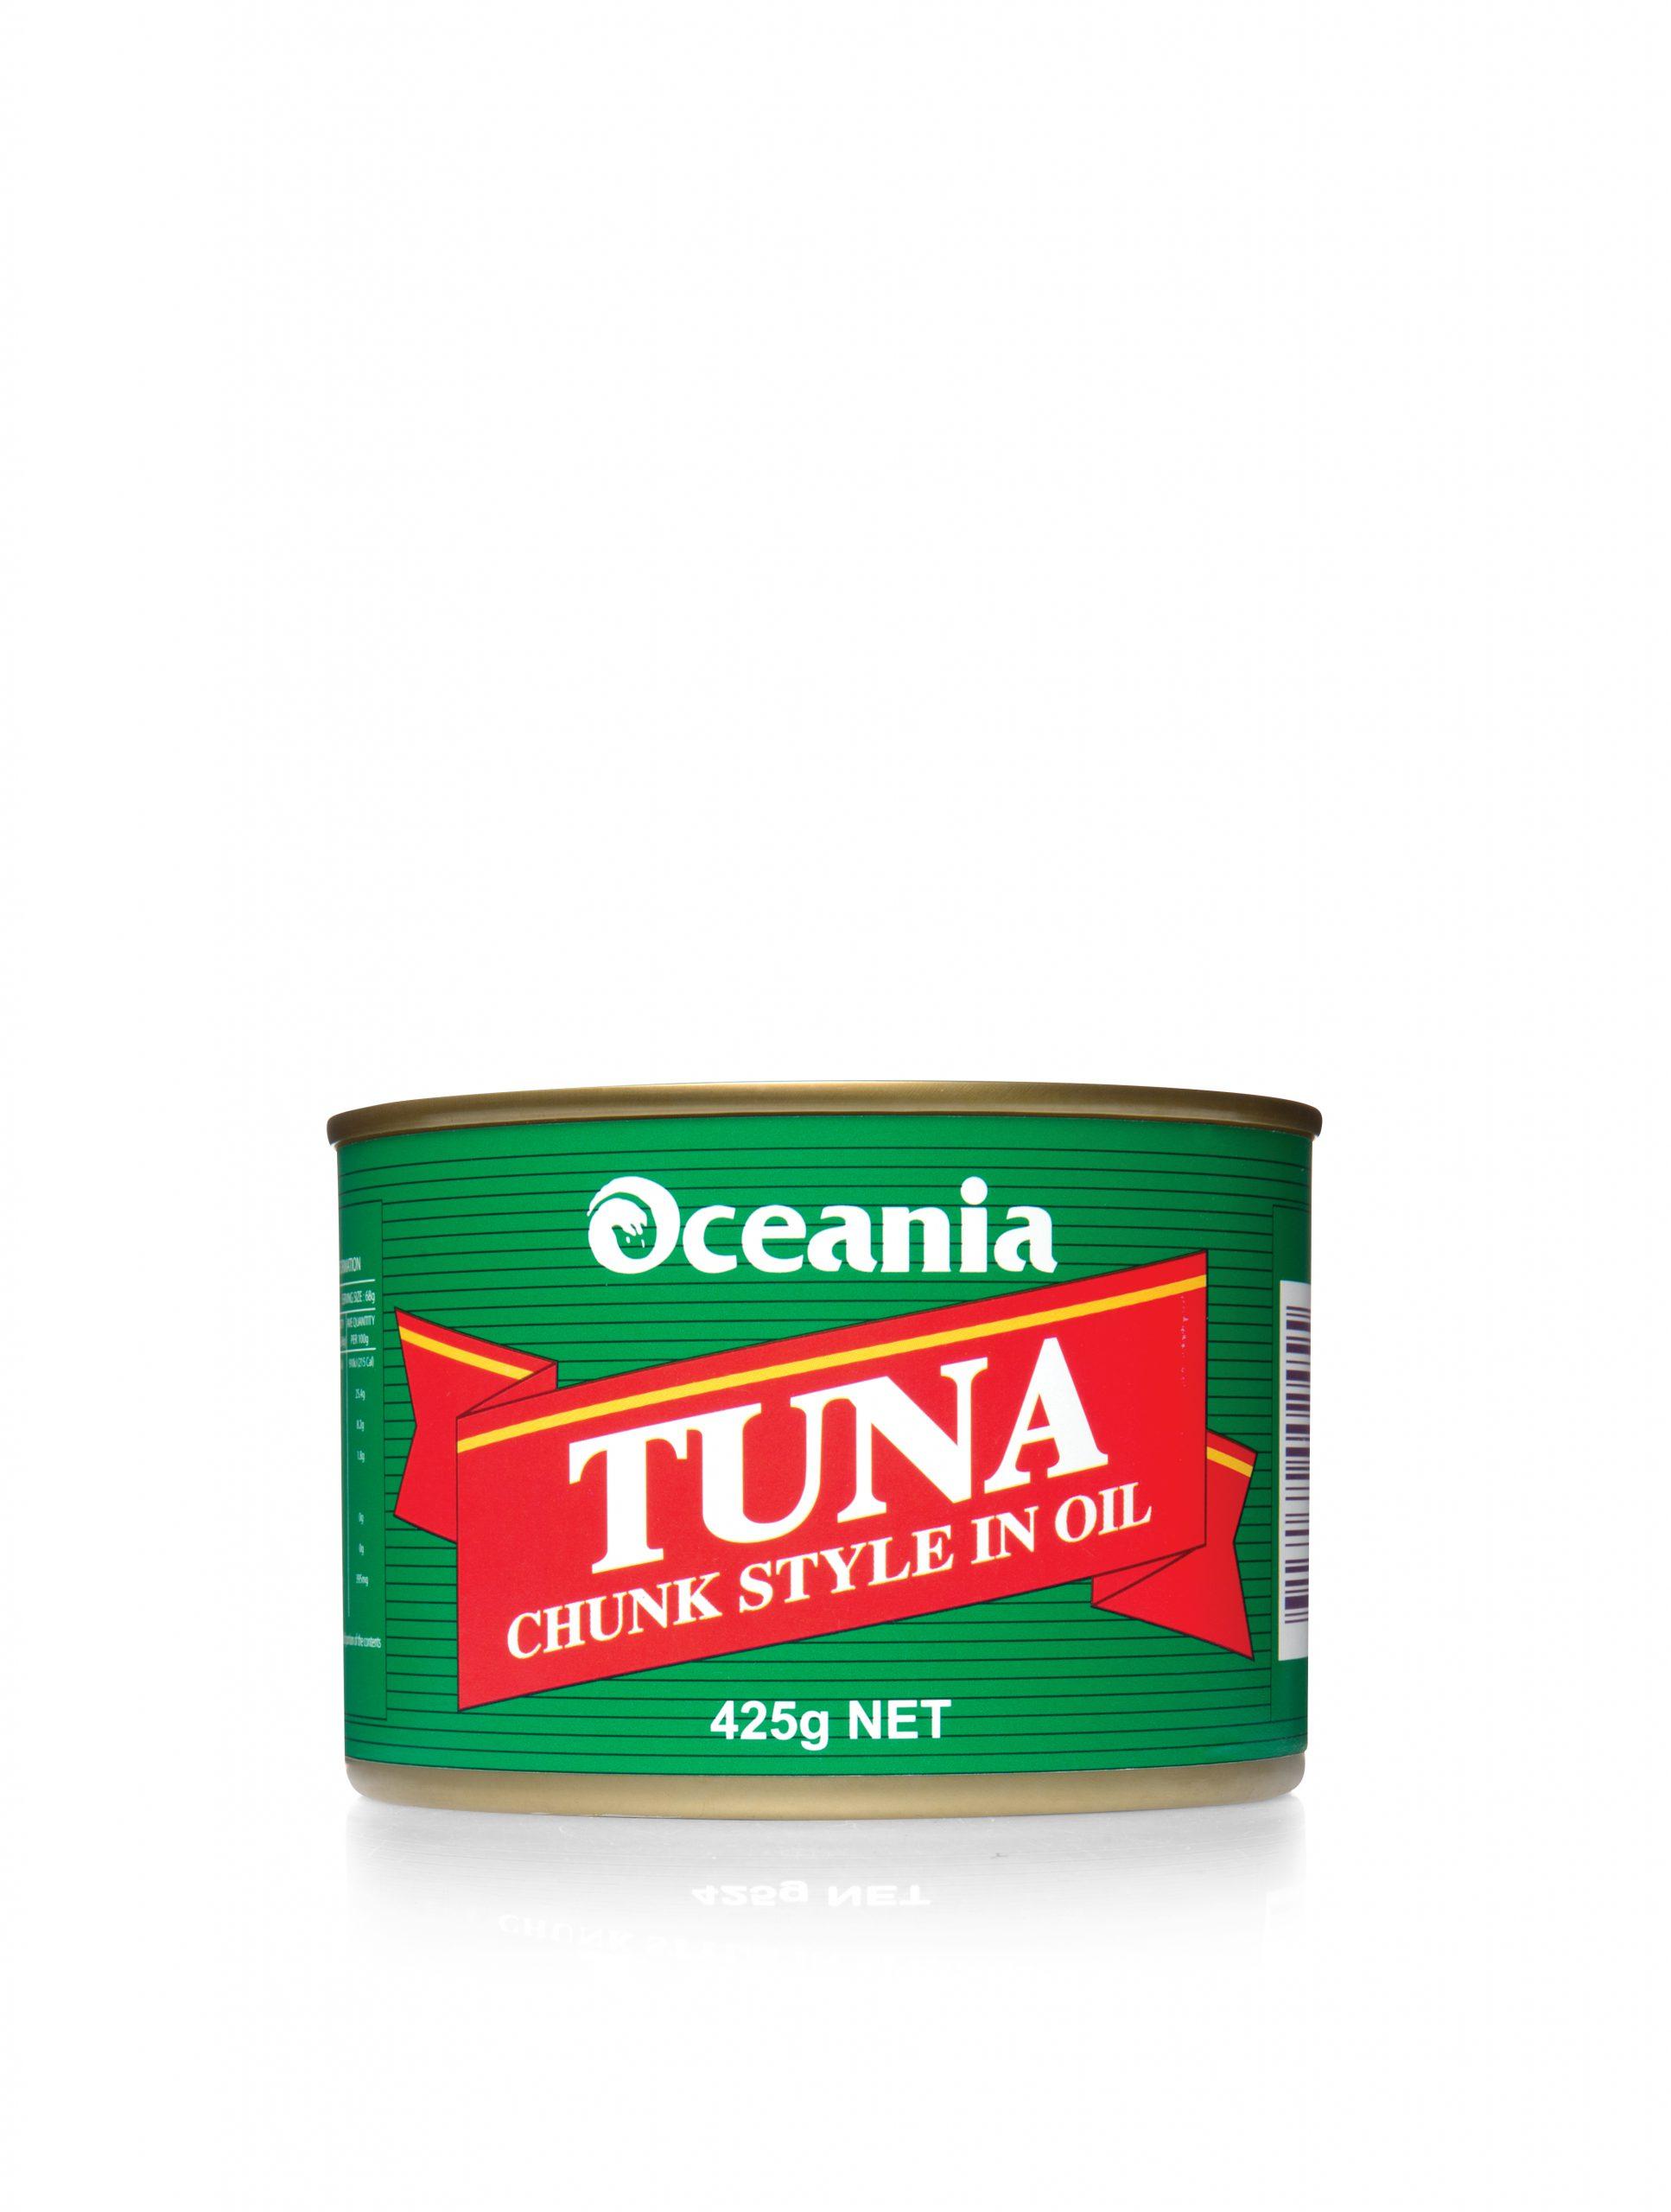 Tuna Chunks In Oil